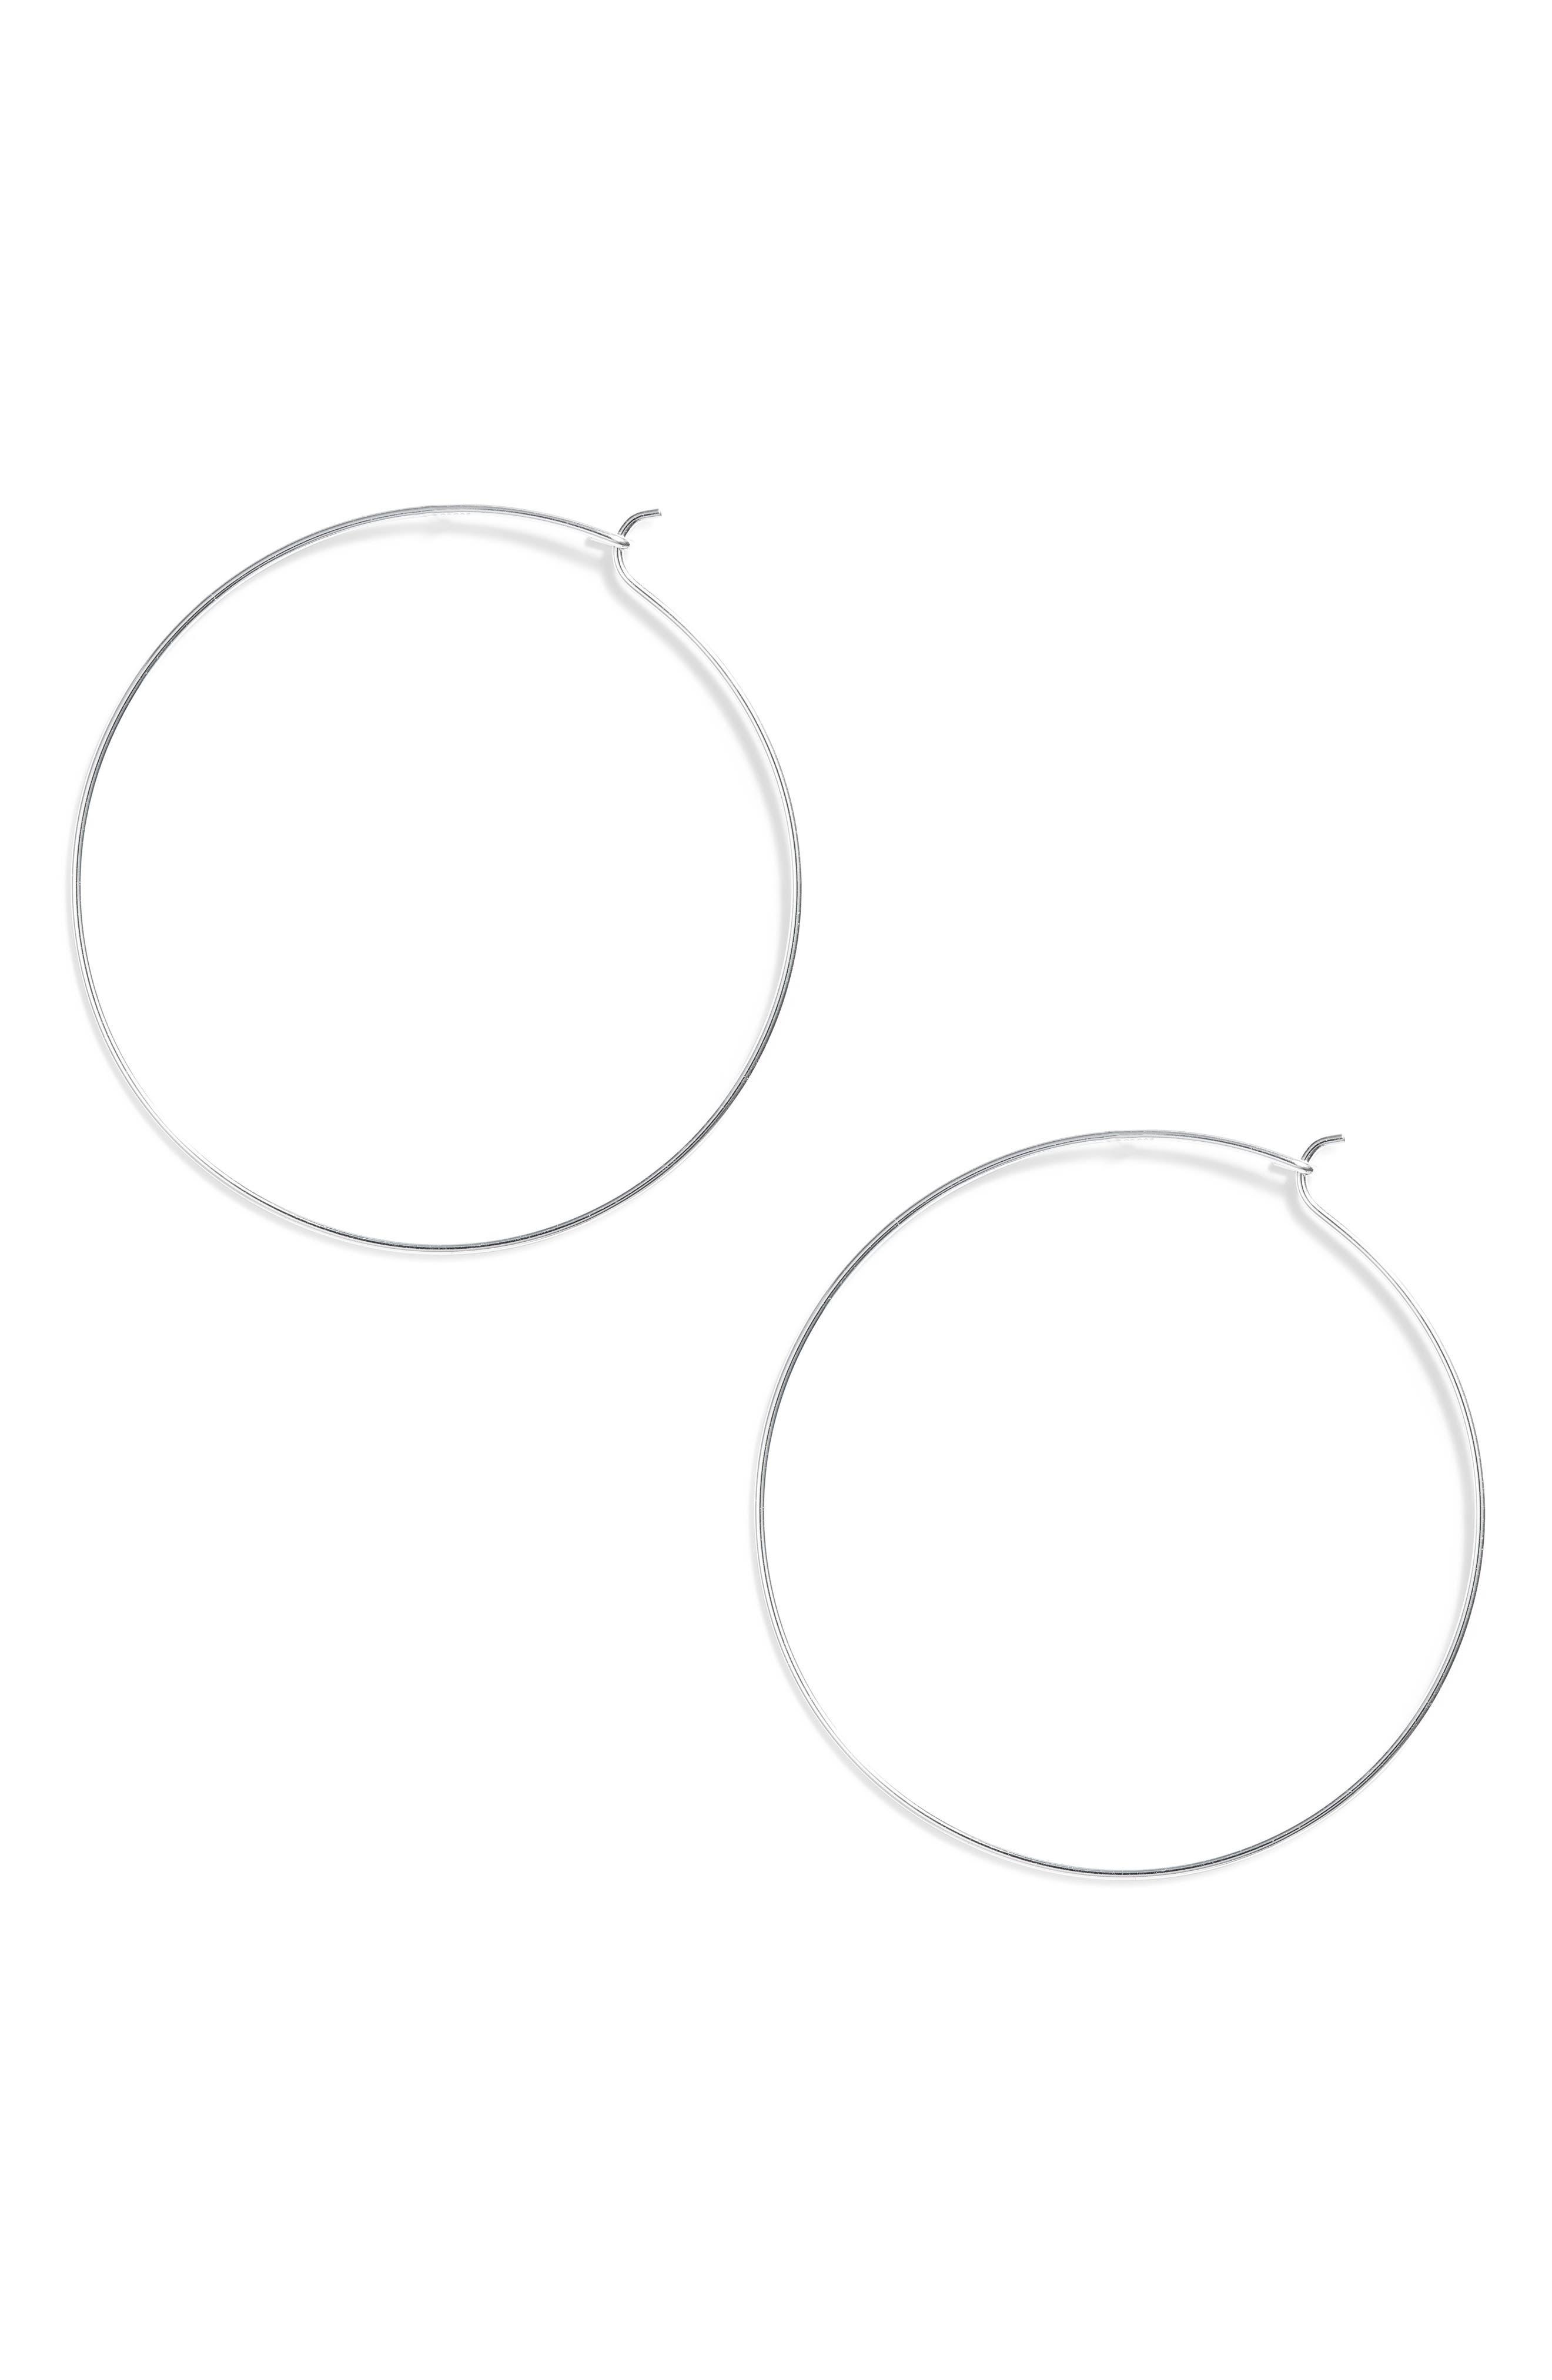 Thin Hoop Earrings,                             Main thumbnail 1, color,                             SILVER